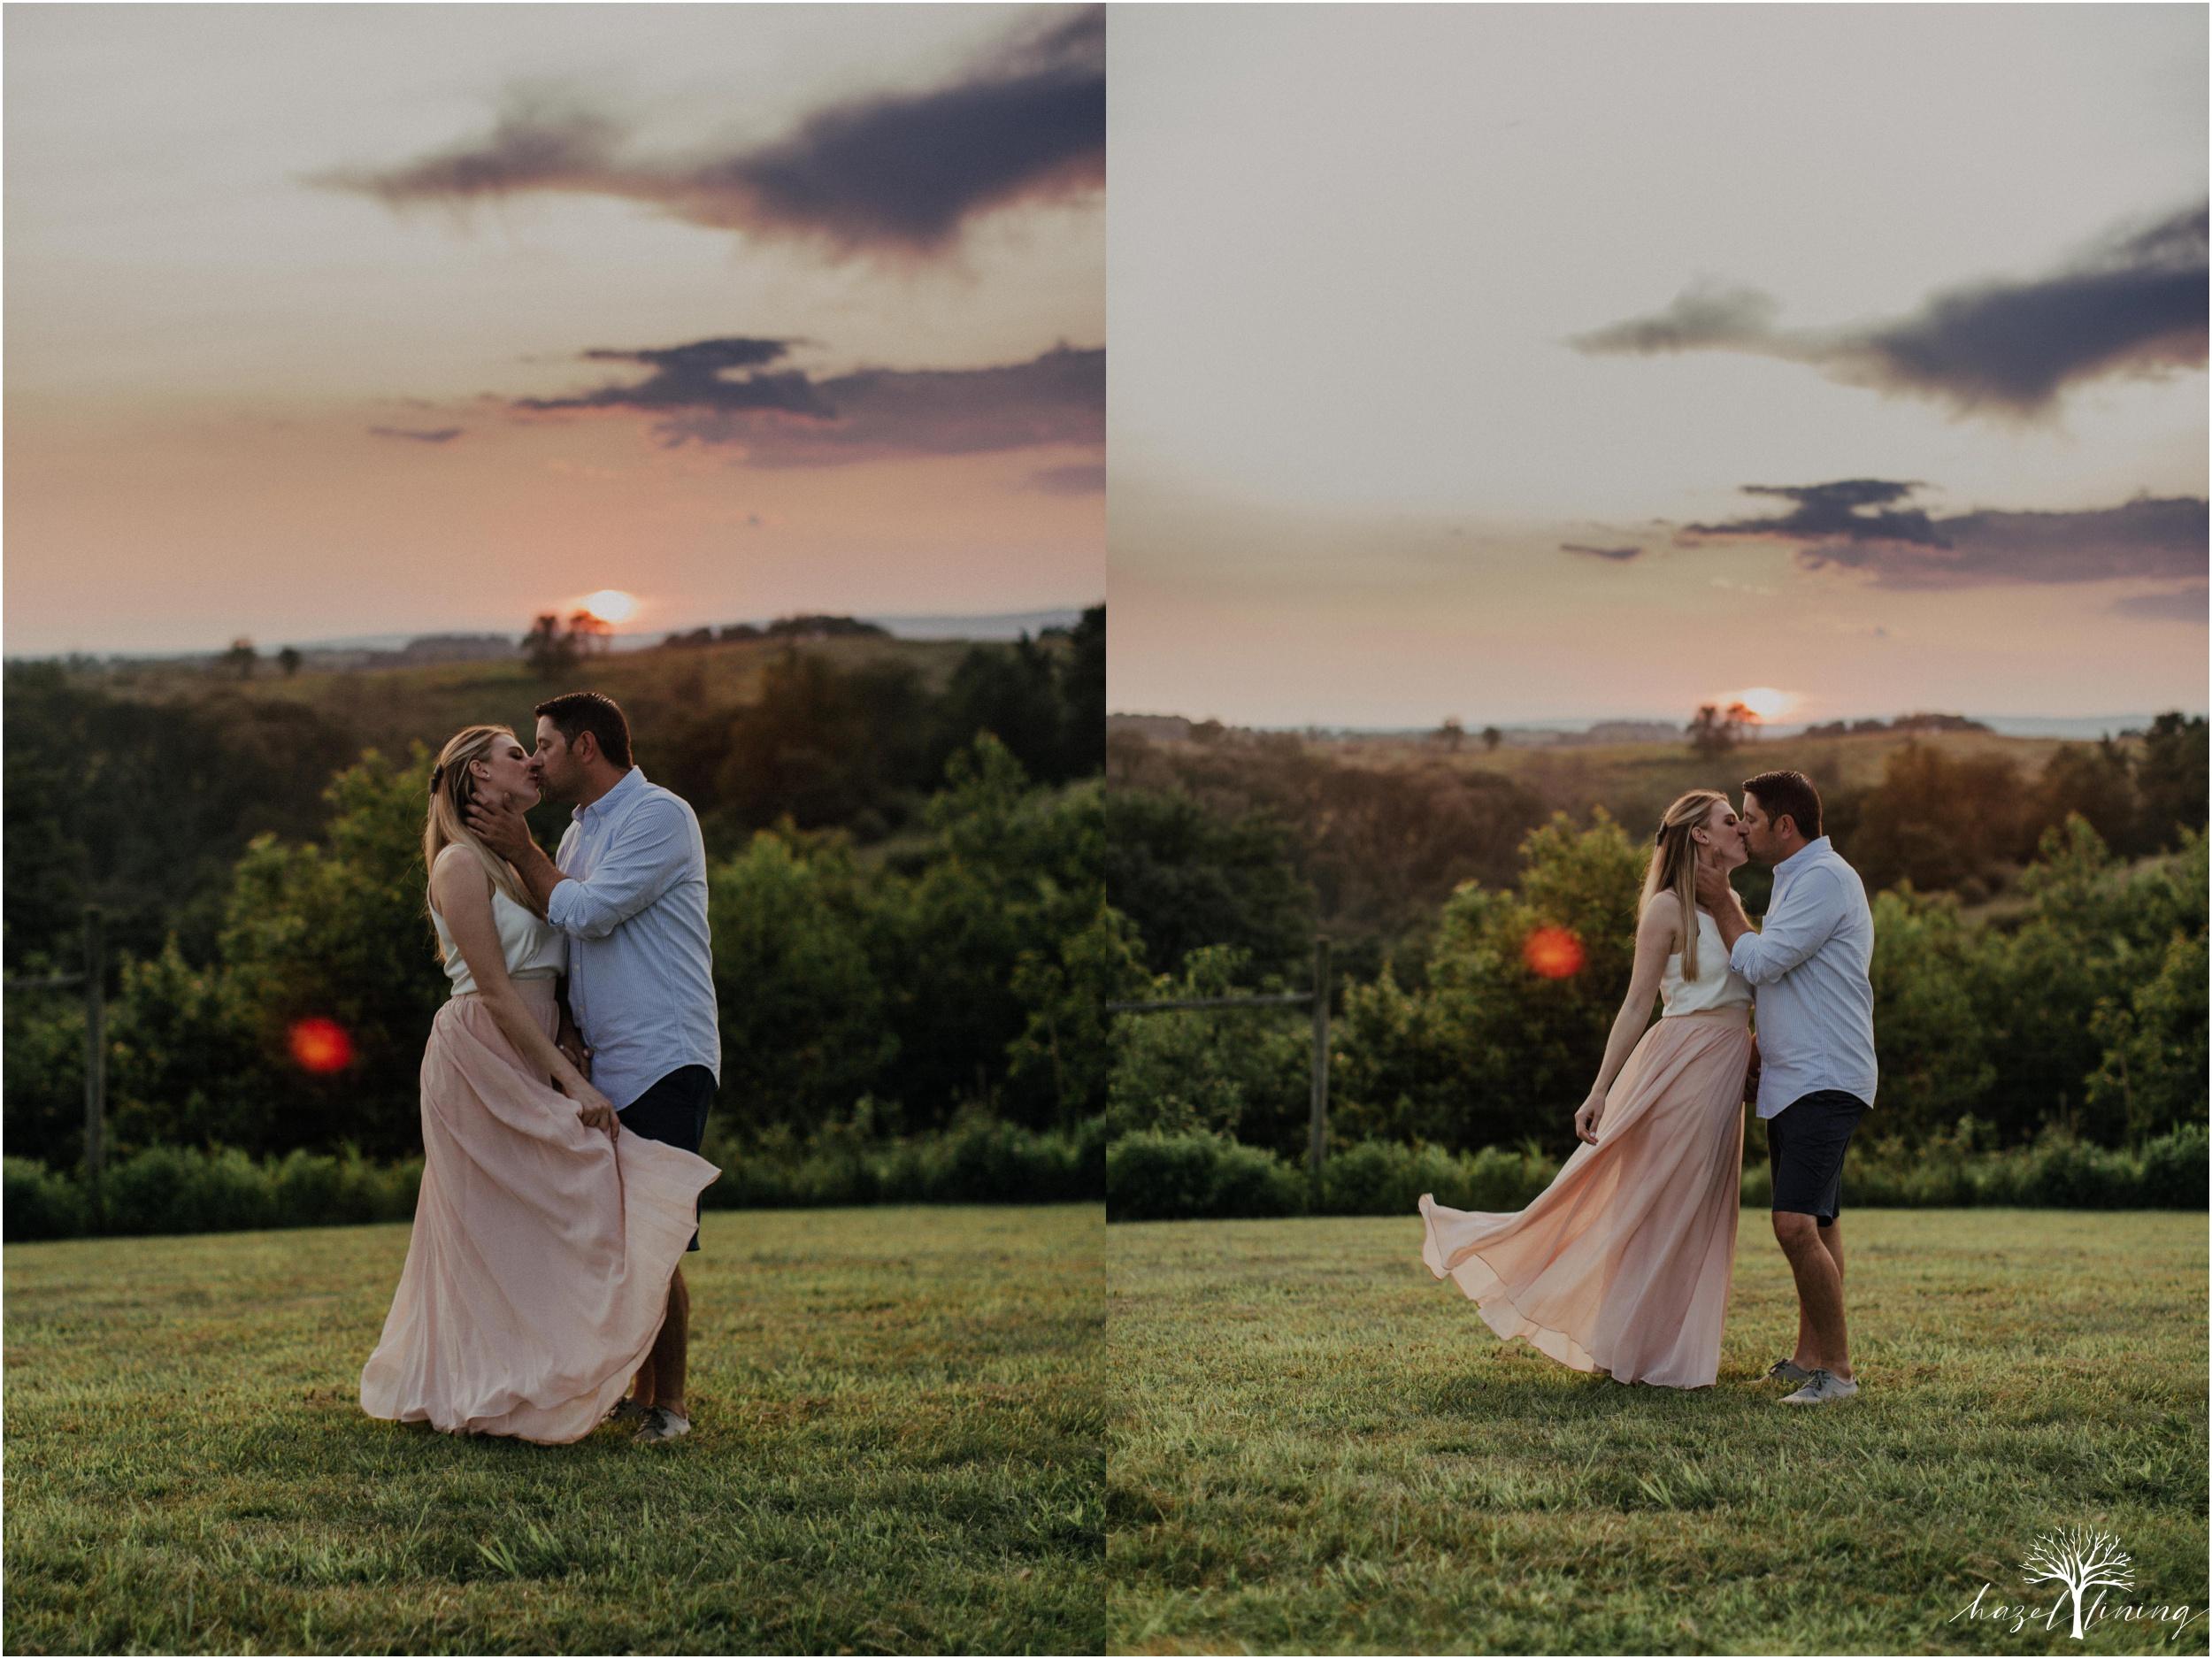 ashley-fillmore-steve-reimer-trexler-nature-preserve-summer-engagement-session-schnecksville-pennsylvania-hazel-lining-photography-destination-elopement-wedding-engagement-photography_0058.jpg